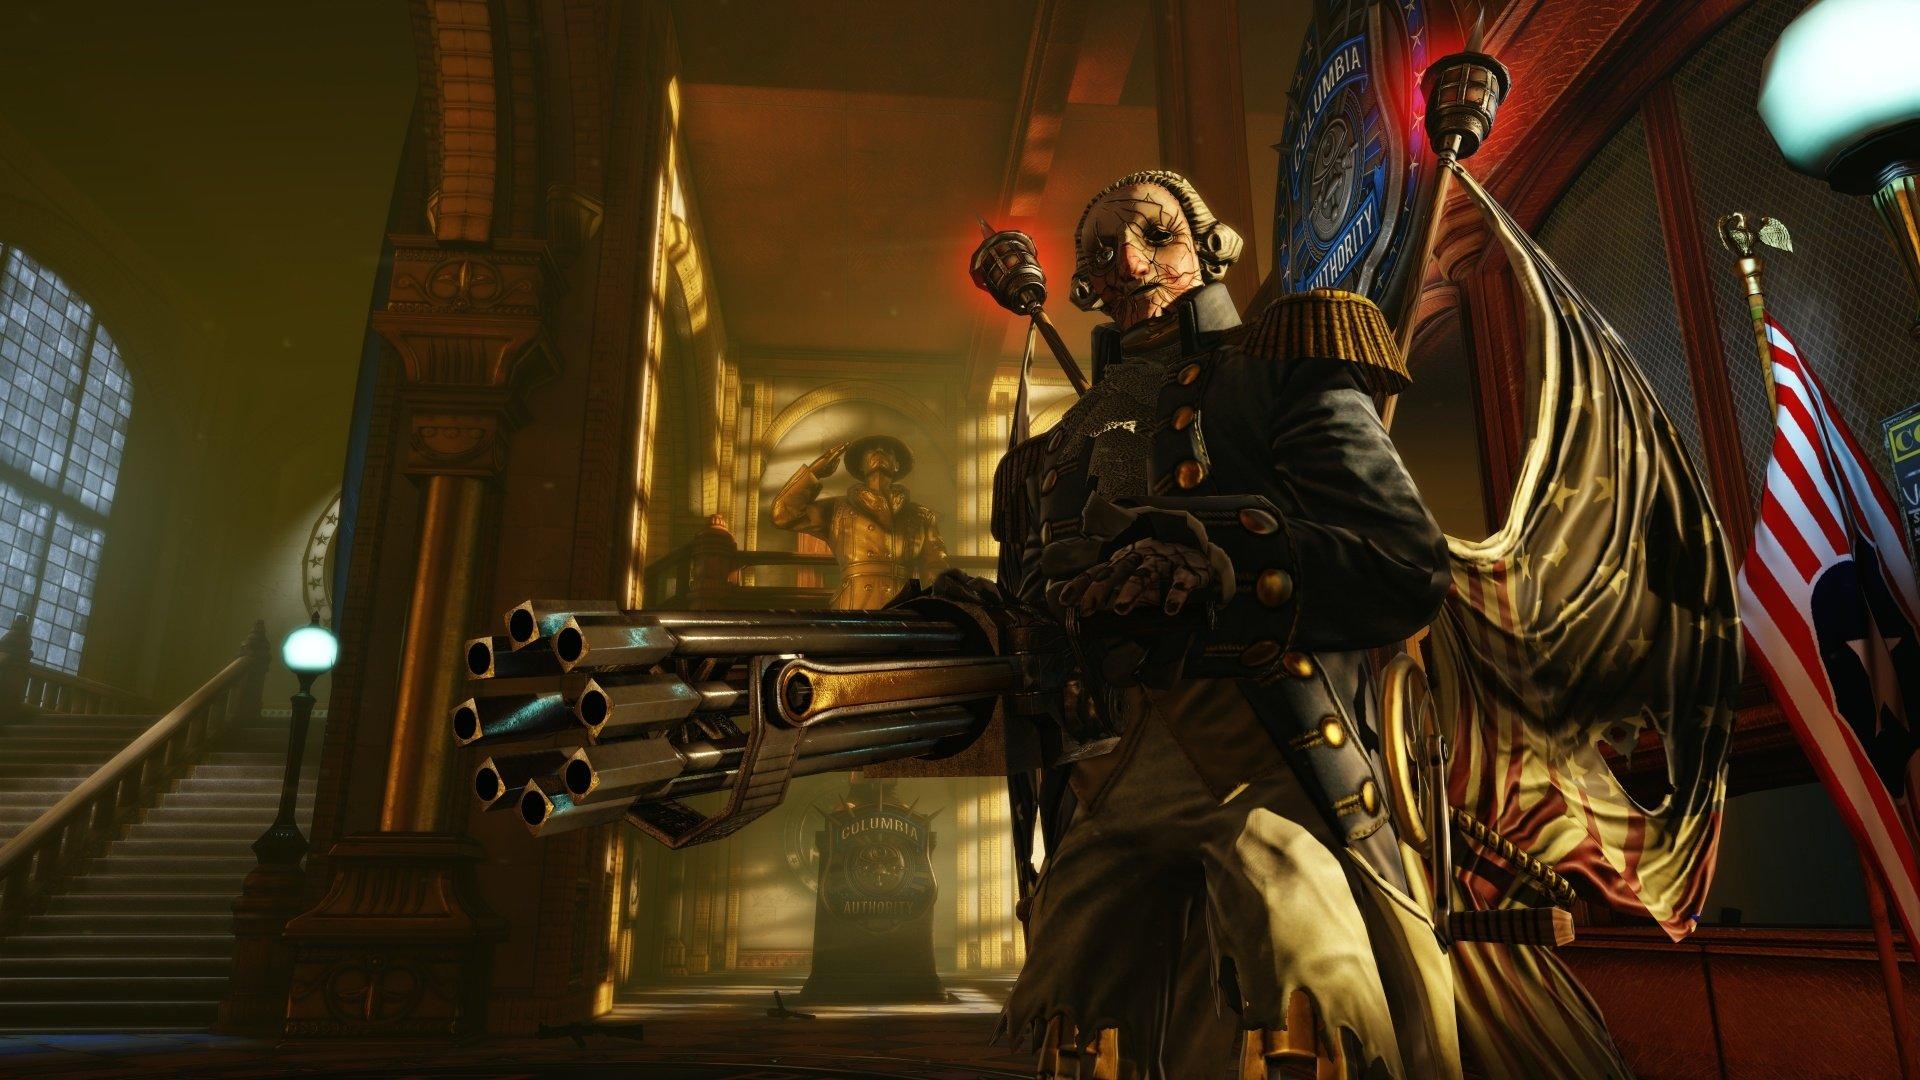 BioShock-Infinite-Motorized-Patriot